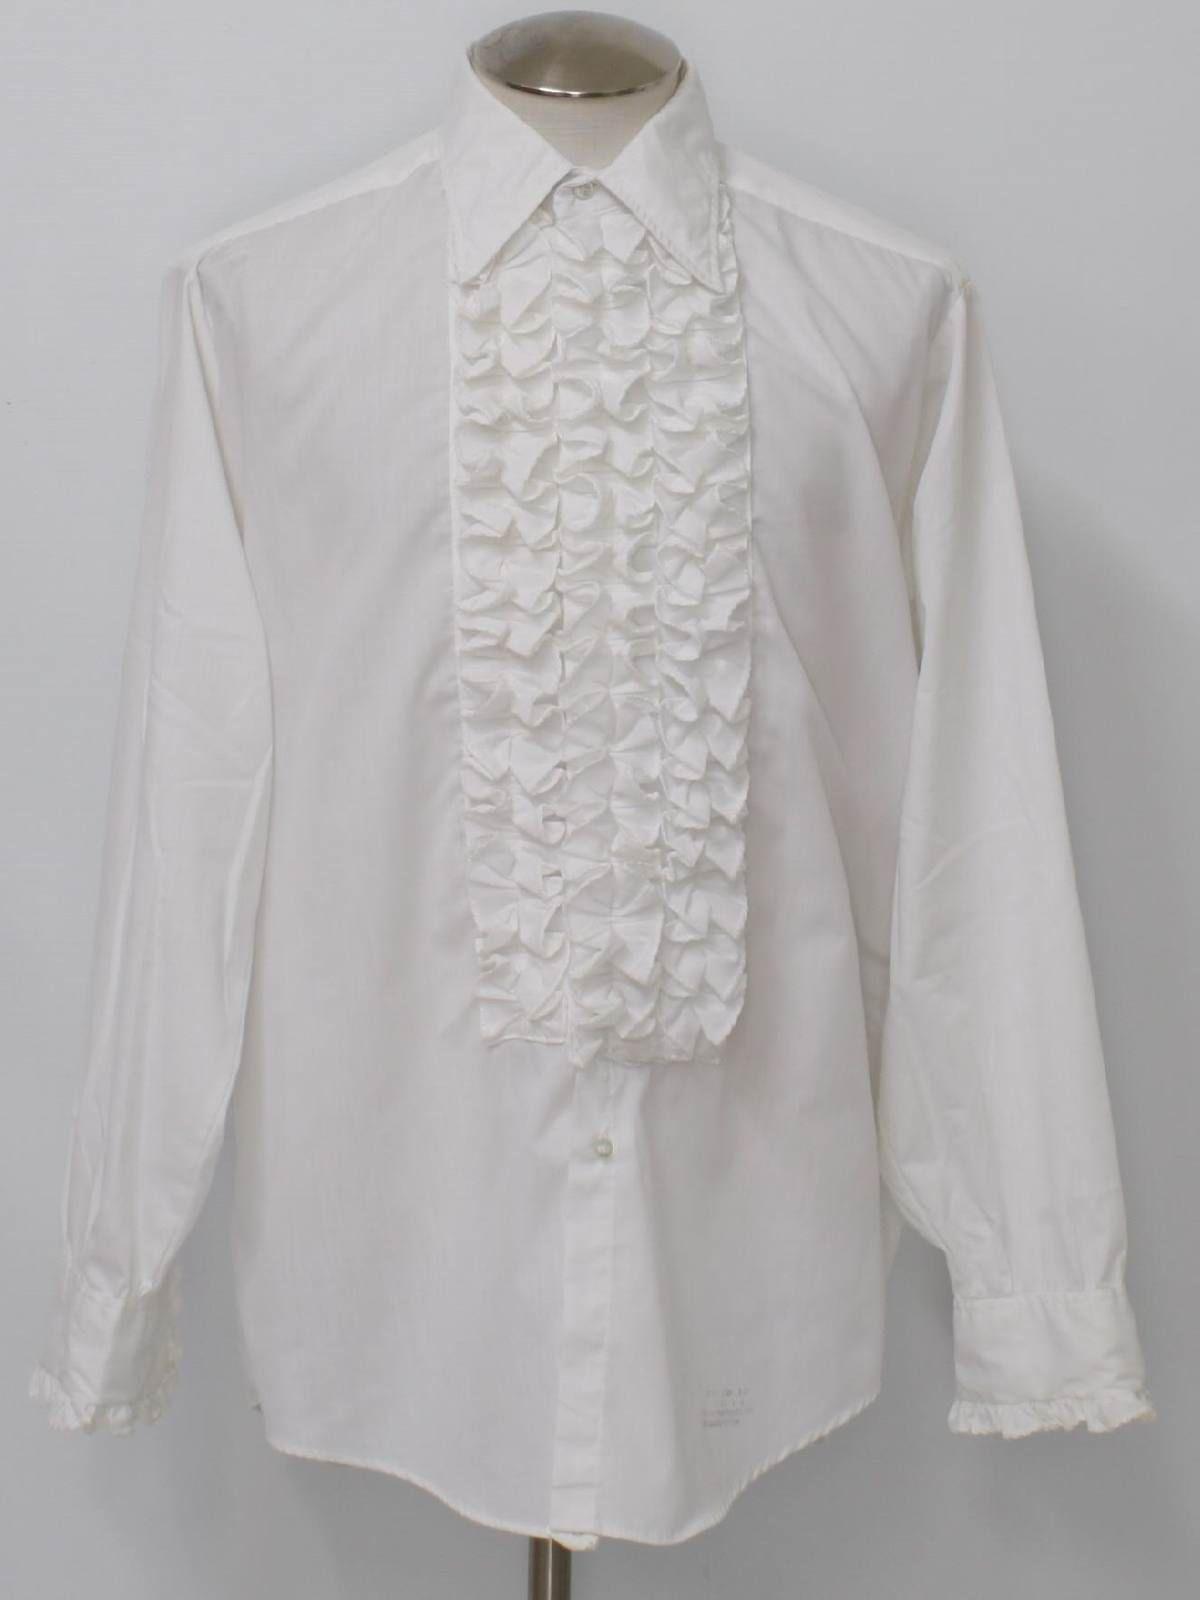 Rustyzipper Com Vintage Clothing Mens White Dress Shirt Ruffled Dress Shirt White Ruffle Dress